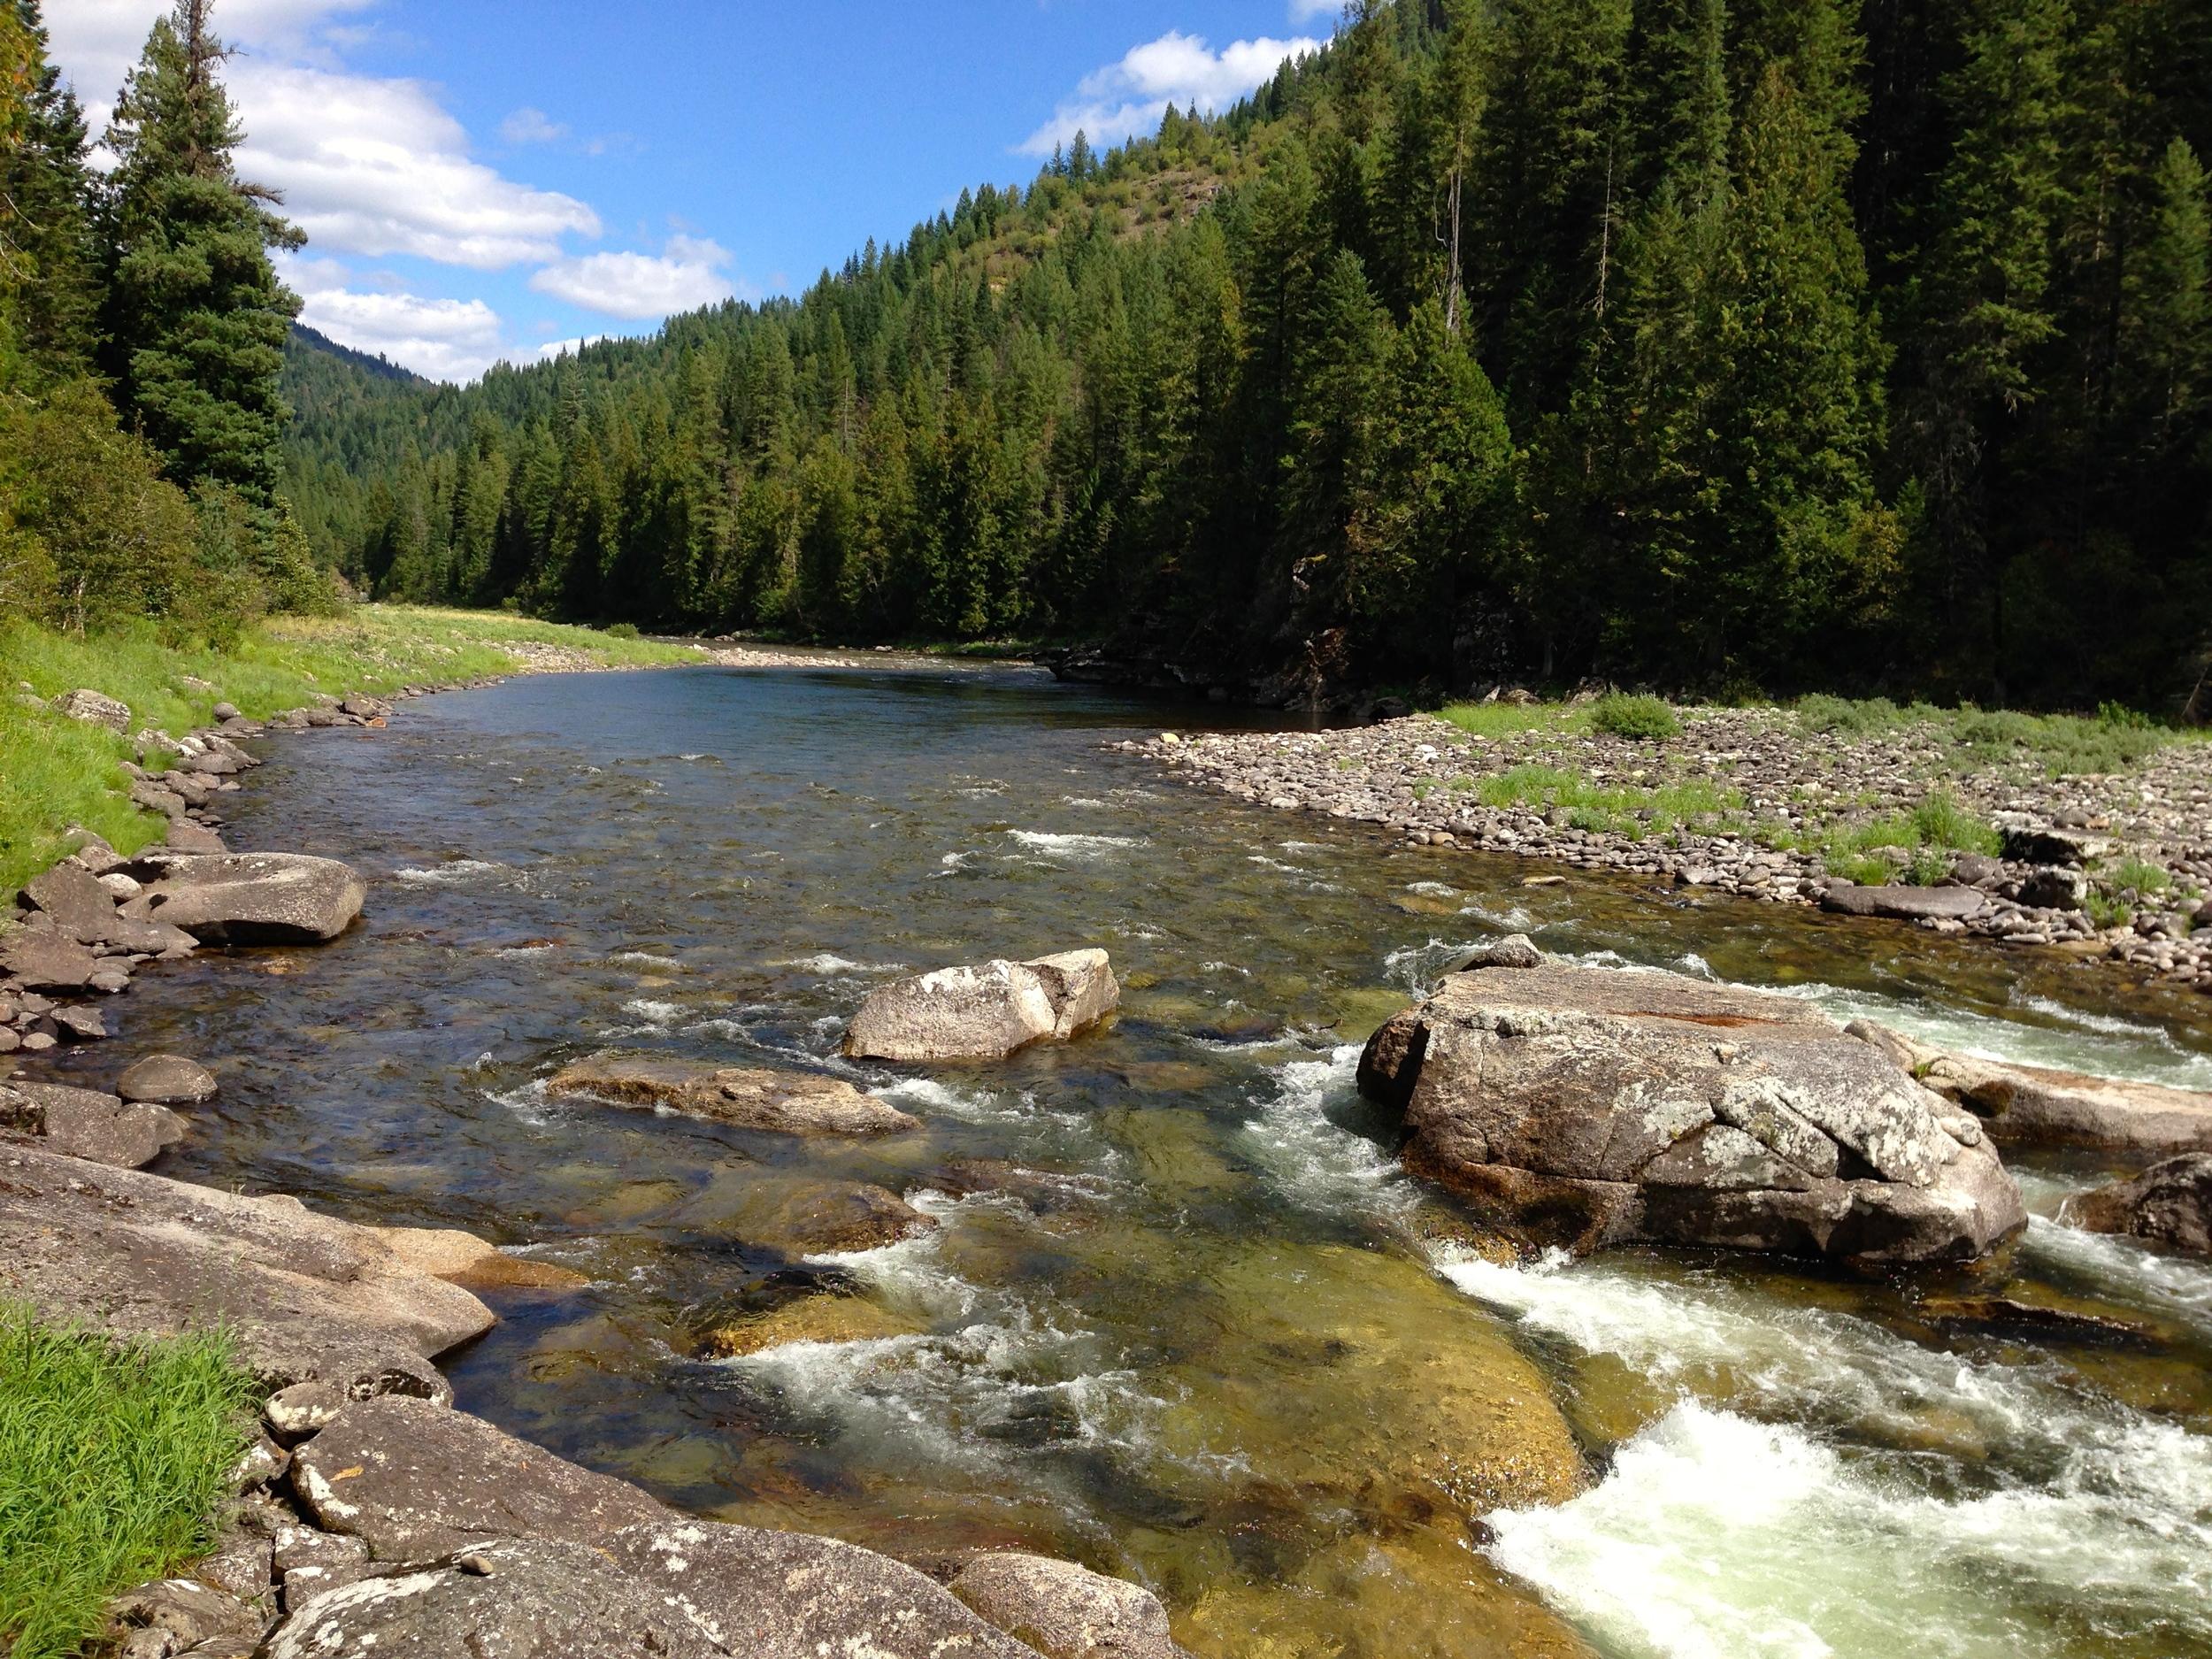 The beautiful Lochsa River